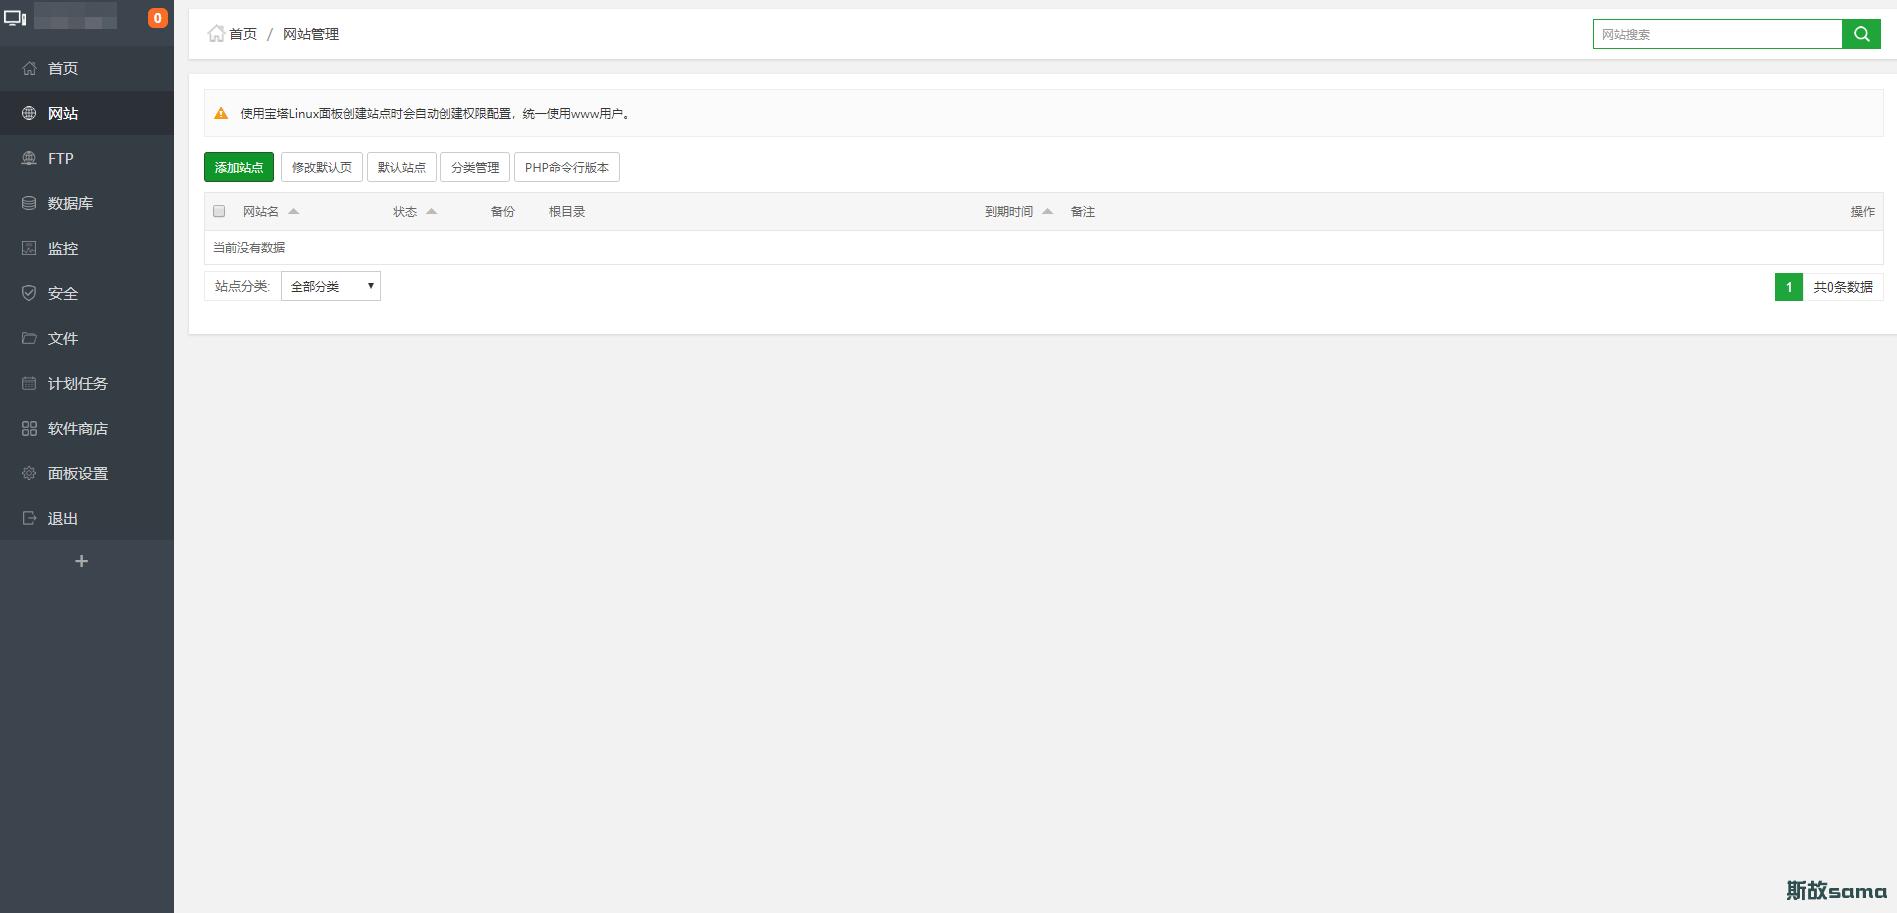 SearX——聚合搜索引擎